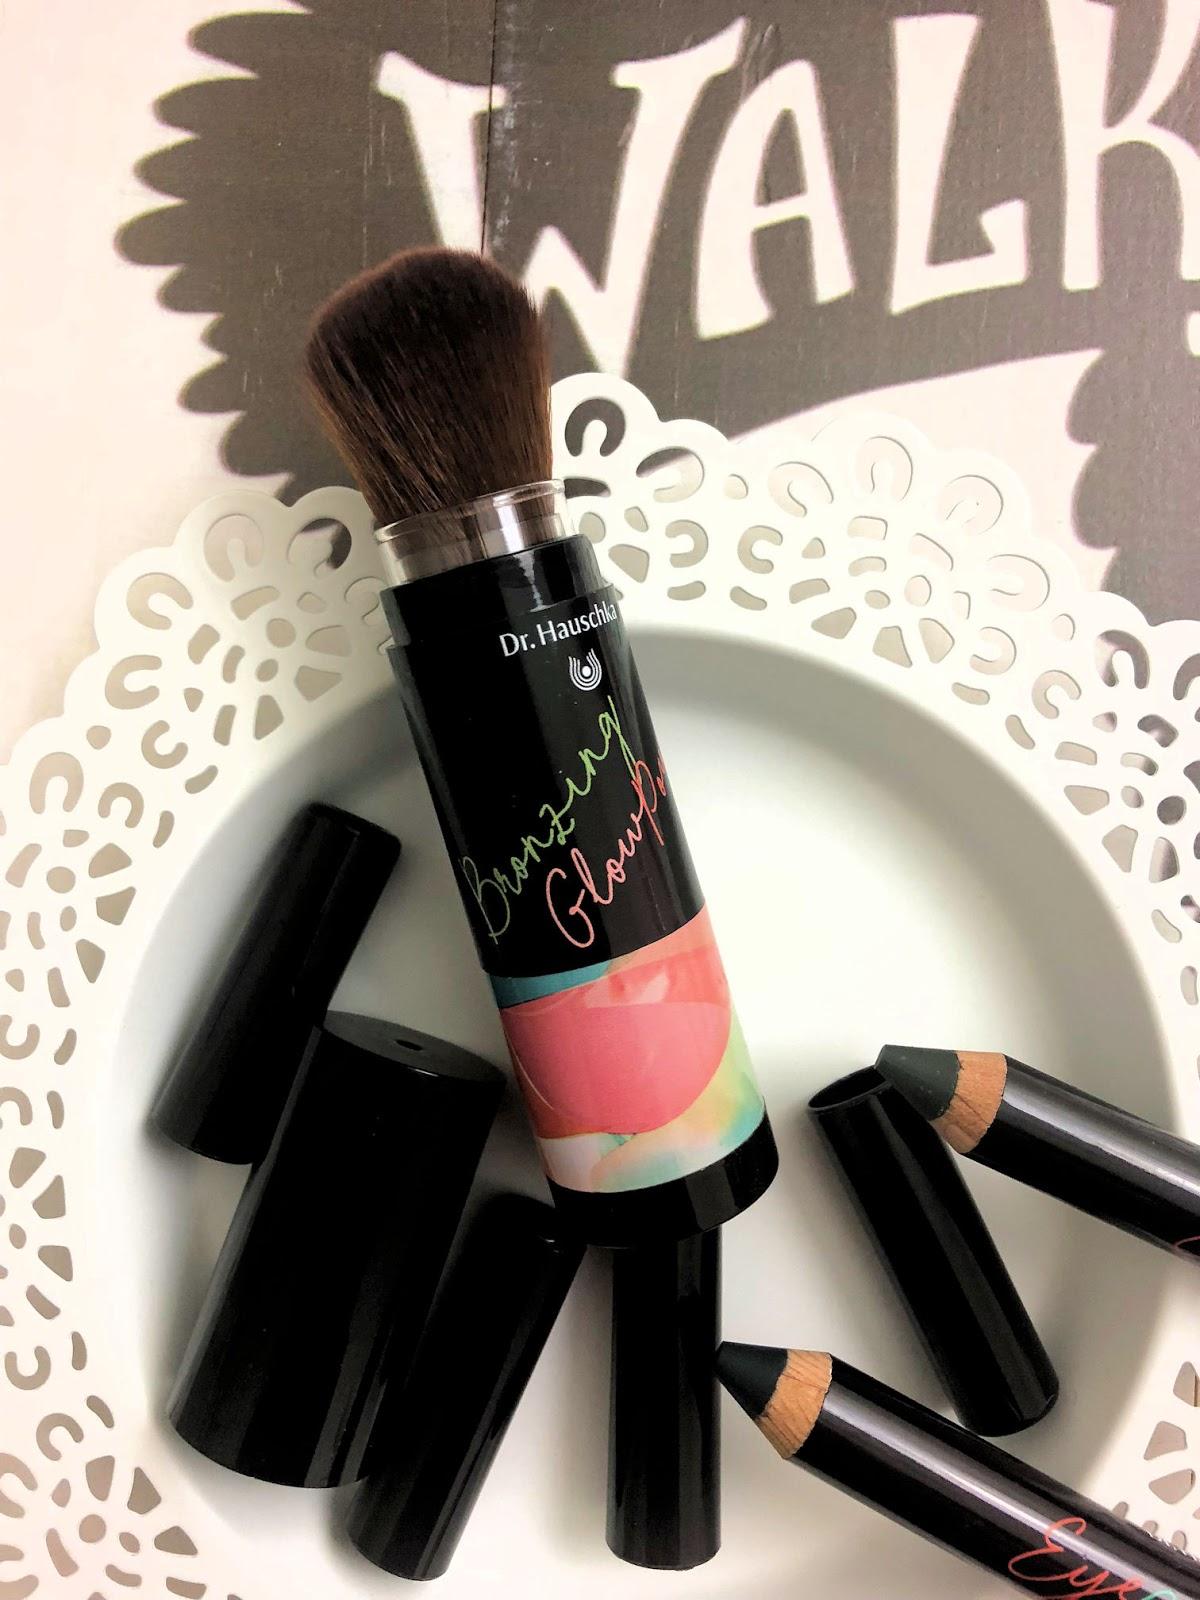 High Spirits: collezione makeup Dr. Hauschka in edizione limitata su Fashion and Cookies fashion and beauty blog